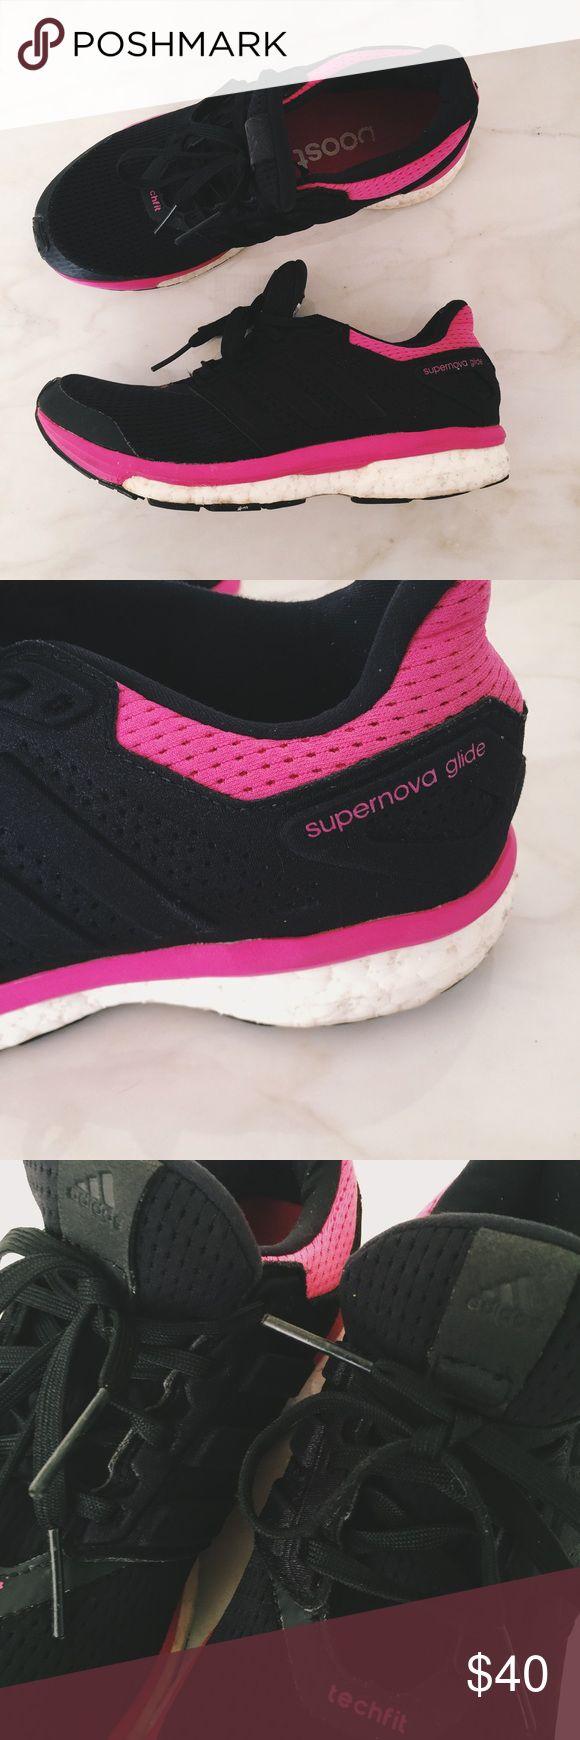 Adidas supernova boost Supernova glide adidas Shoes Athletic Shoes